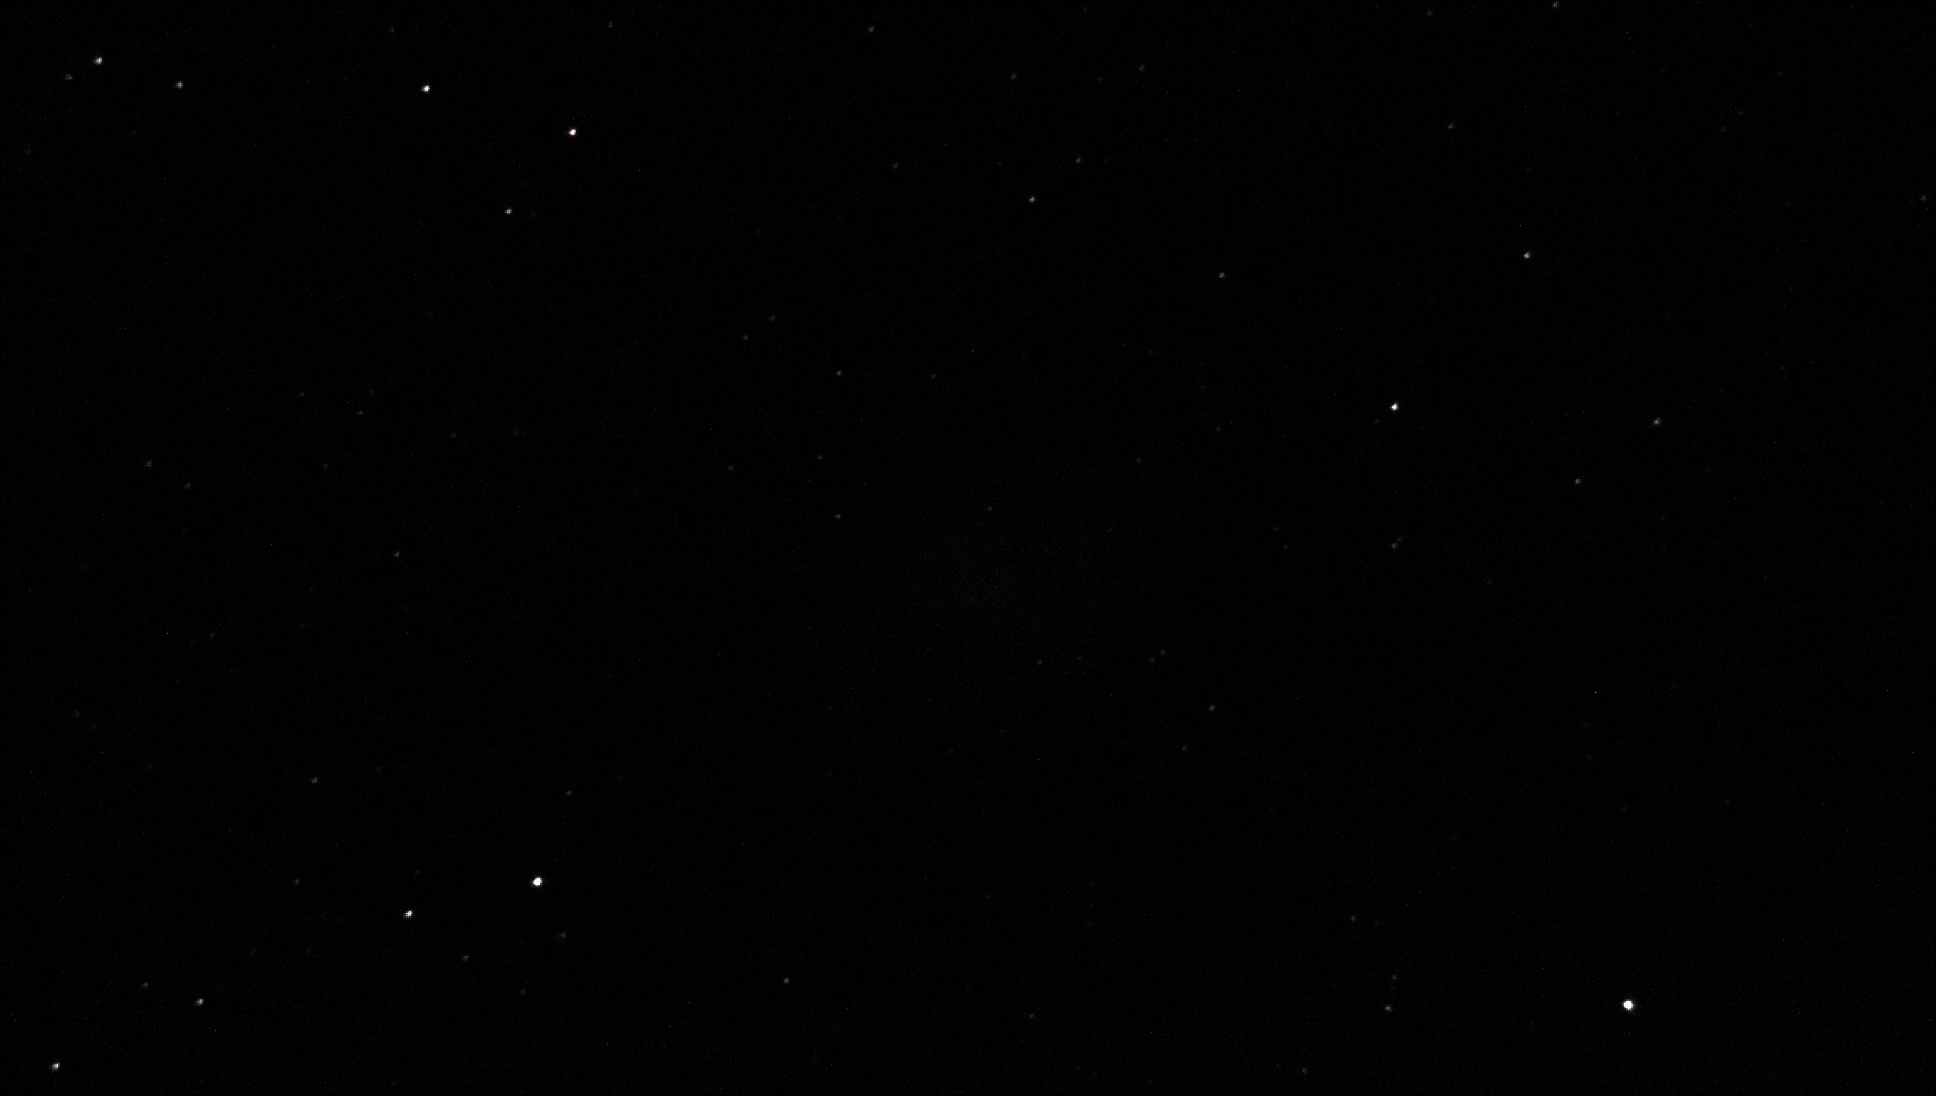 Light_005.jpg.7ffe654887696d89f56ea72884a38c5c.jpg